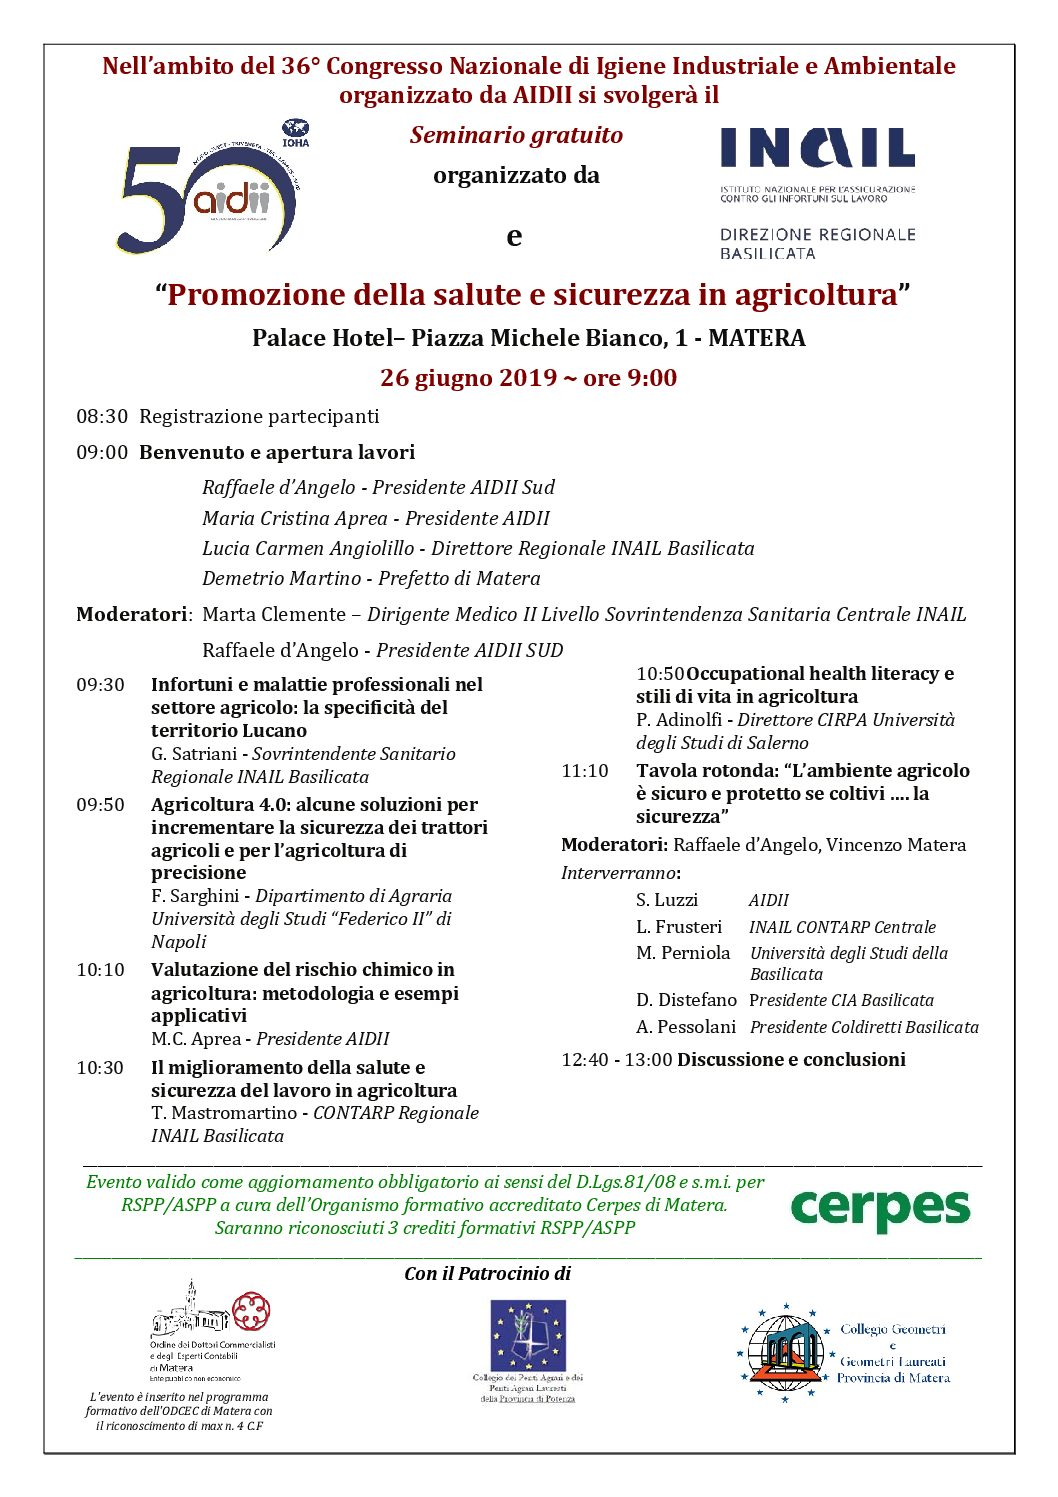 Seminario AIDII-INAIL BasilicataProgramma (Rev 05) Matera 26 Giugno 2019